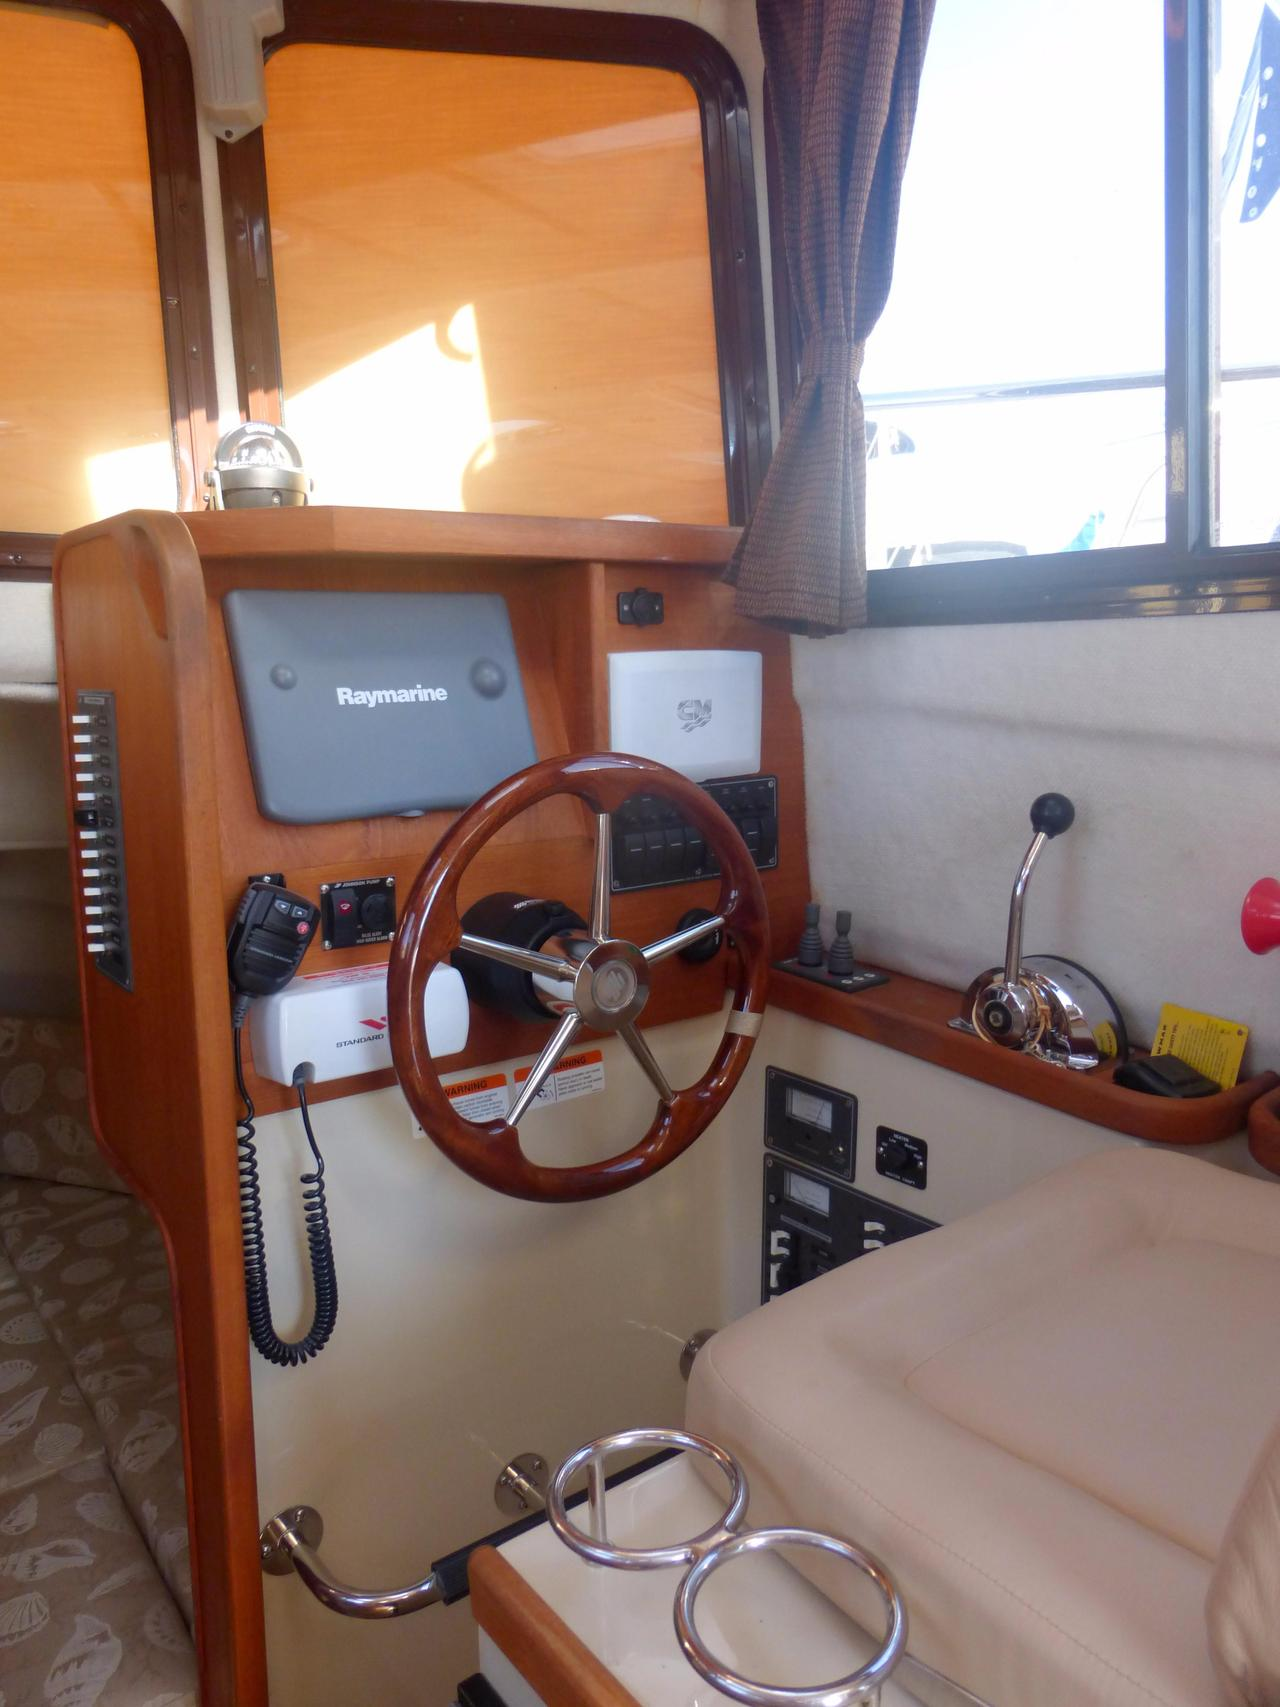 Army Tug Engine Room: 2009 Used Ranger Tugs R-25 Classic Tug Boat For Sale